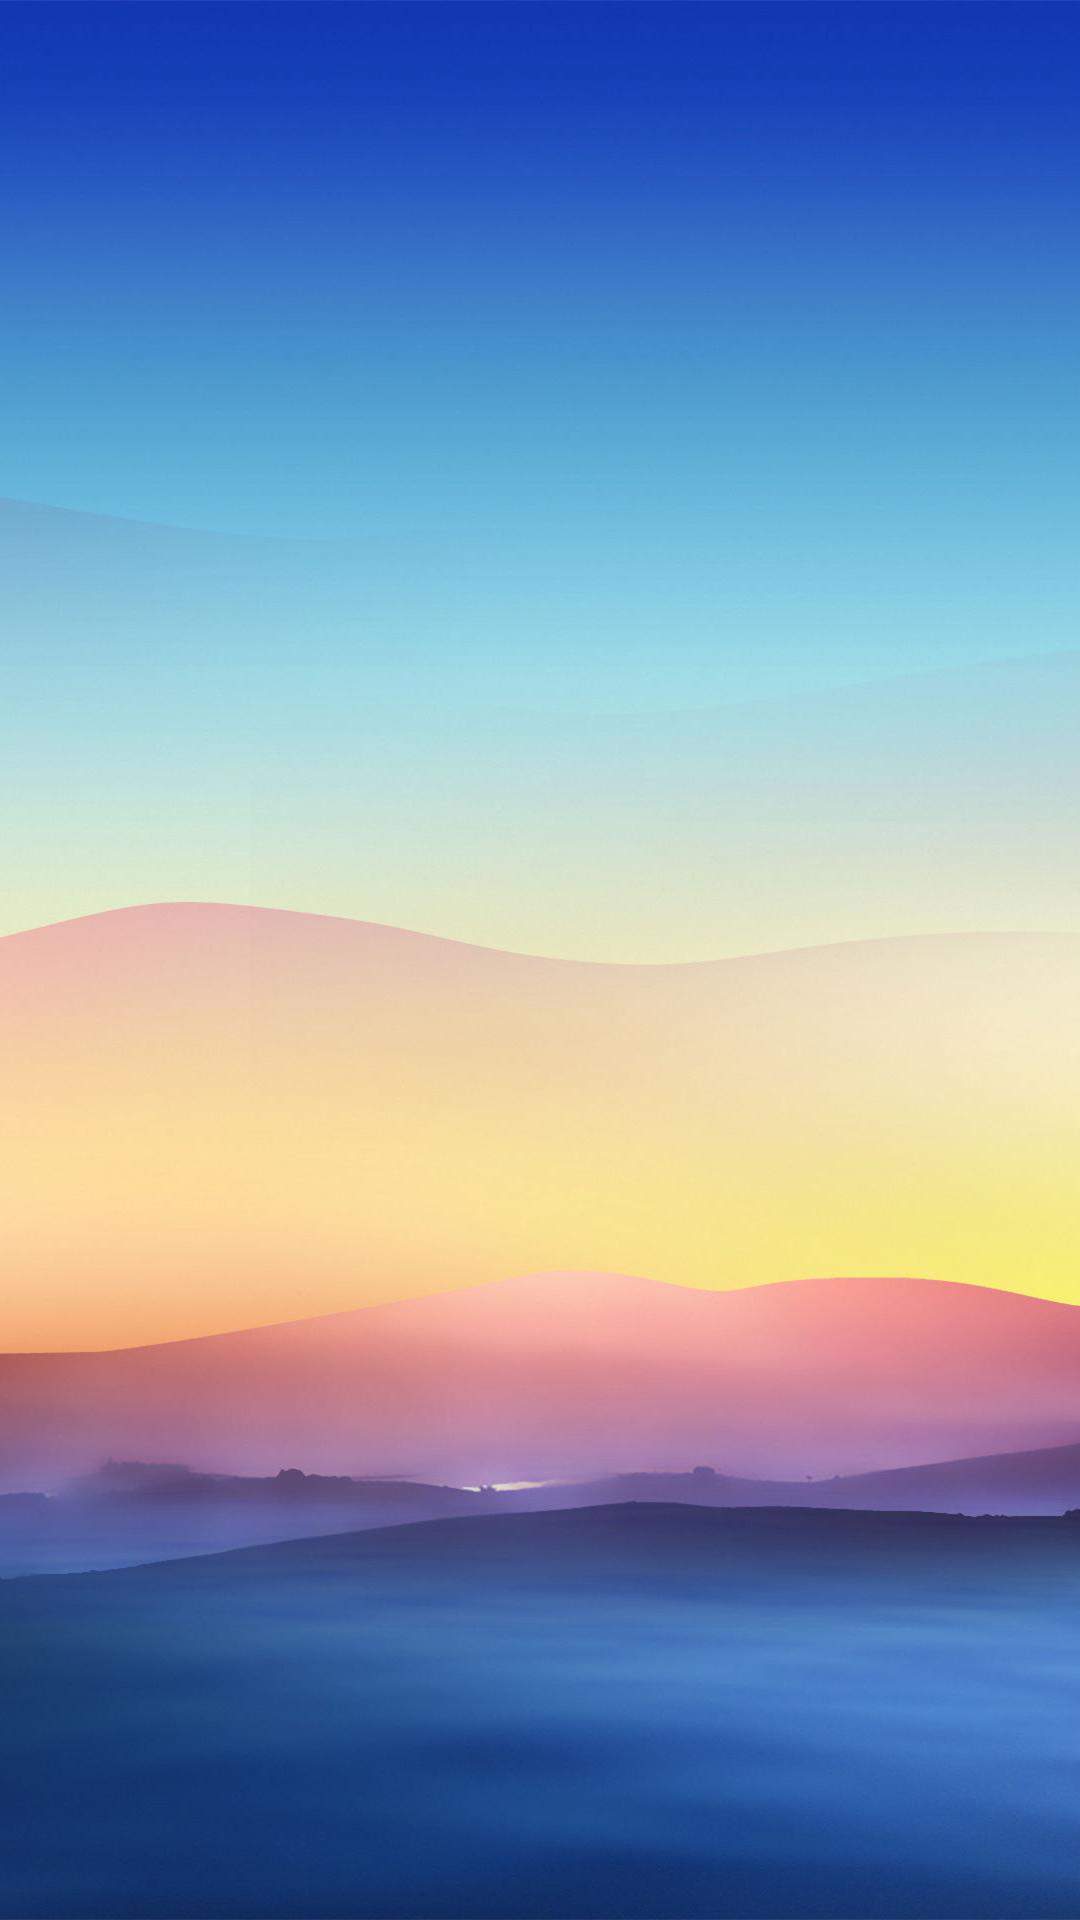 Mi Coleccin de Wallpapers para iPhone 6 iPhone 6 Plus 1080x1920